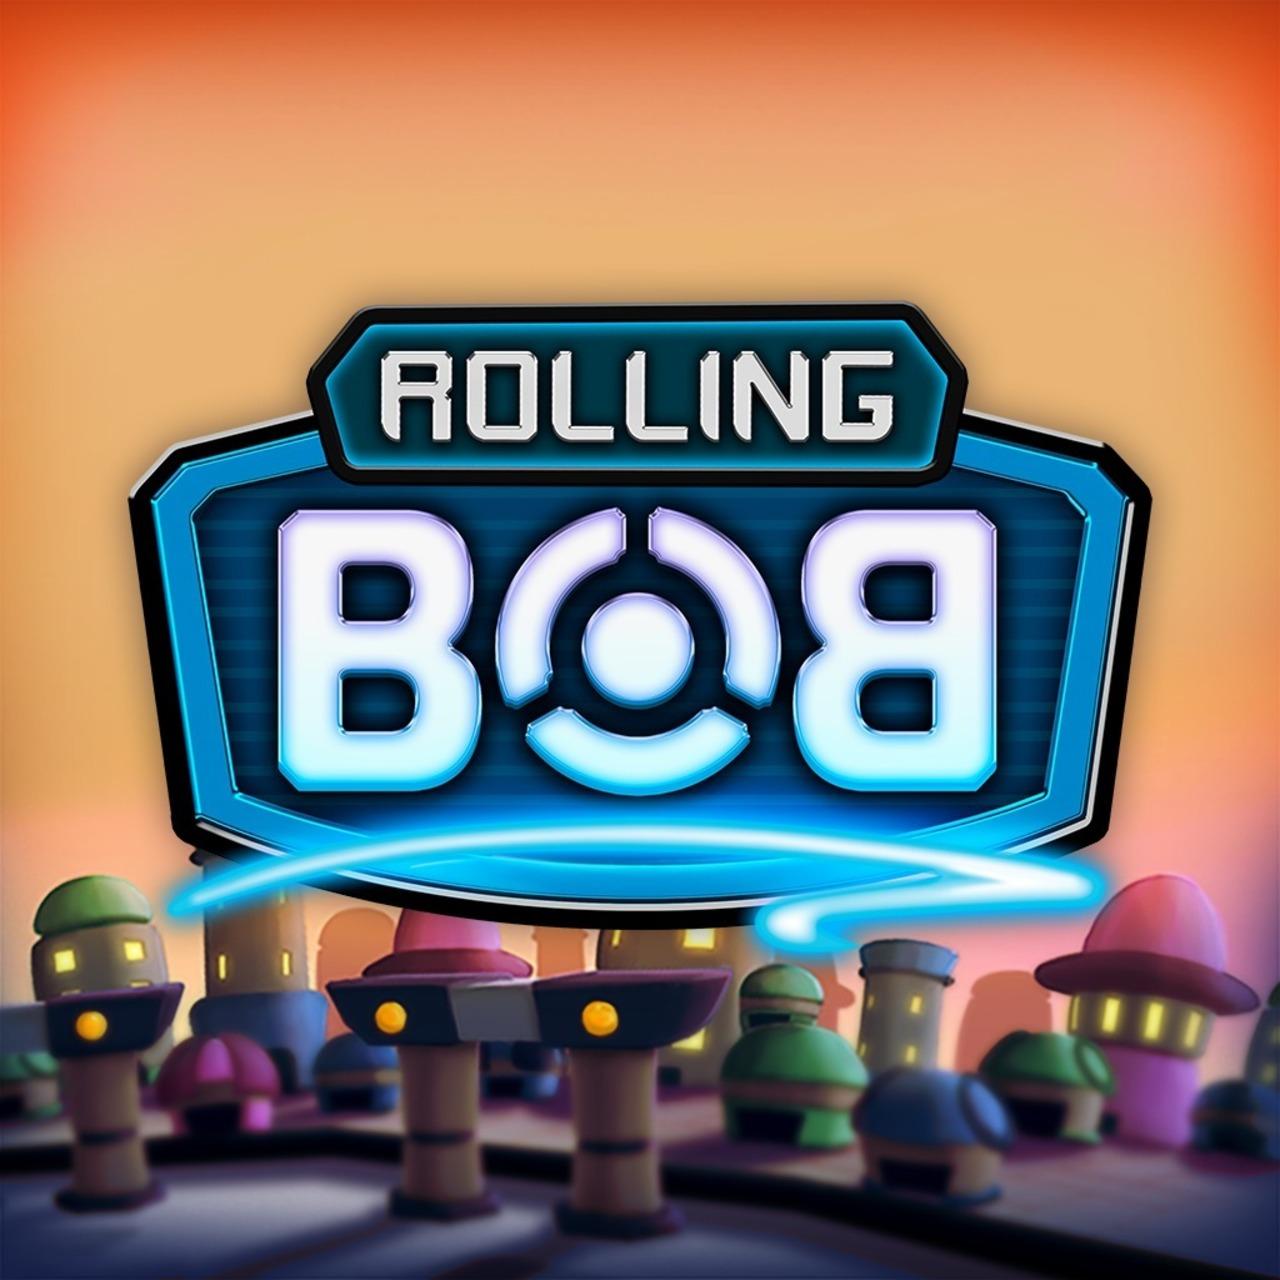 Rolling Bob pc game free download